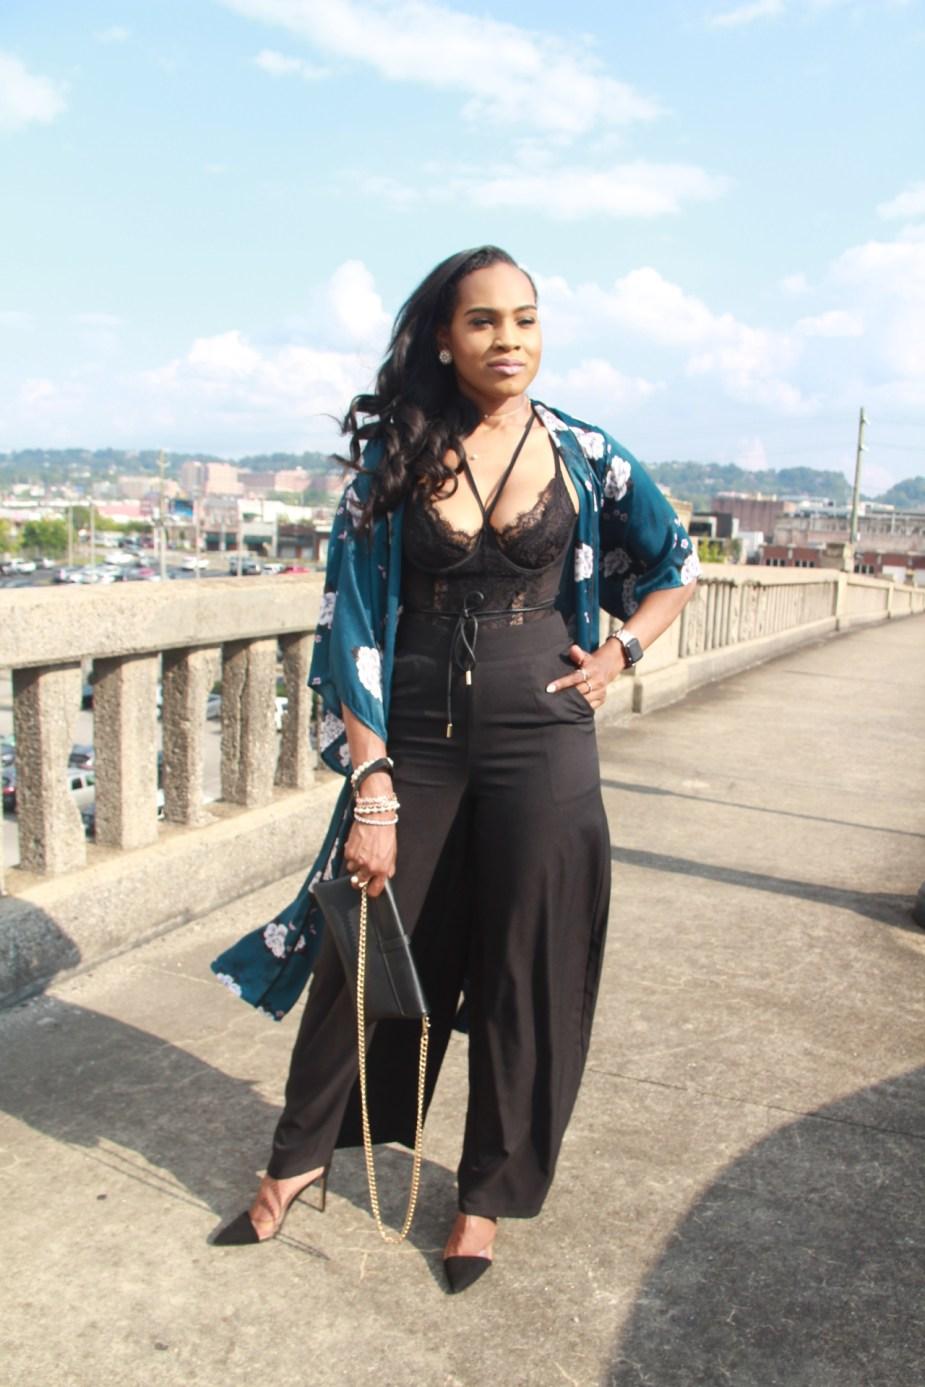 Style-files-Monteau-Green-floral-kimono-Boohoo-Wideleg-pants-zara-pvc-clear-black-pumps-forever21-lace-corset-bodysuit-ooohlalablog-3